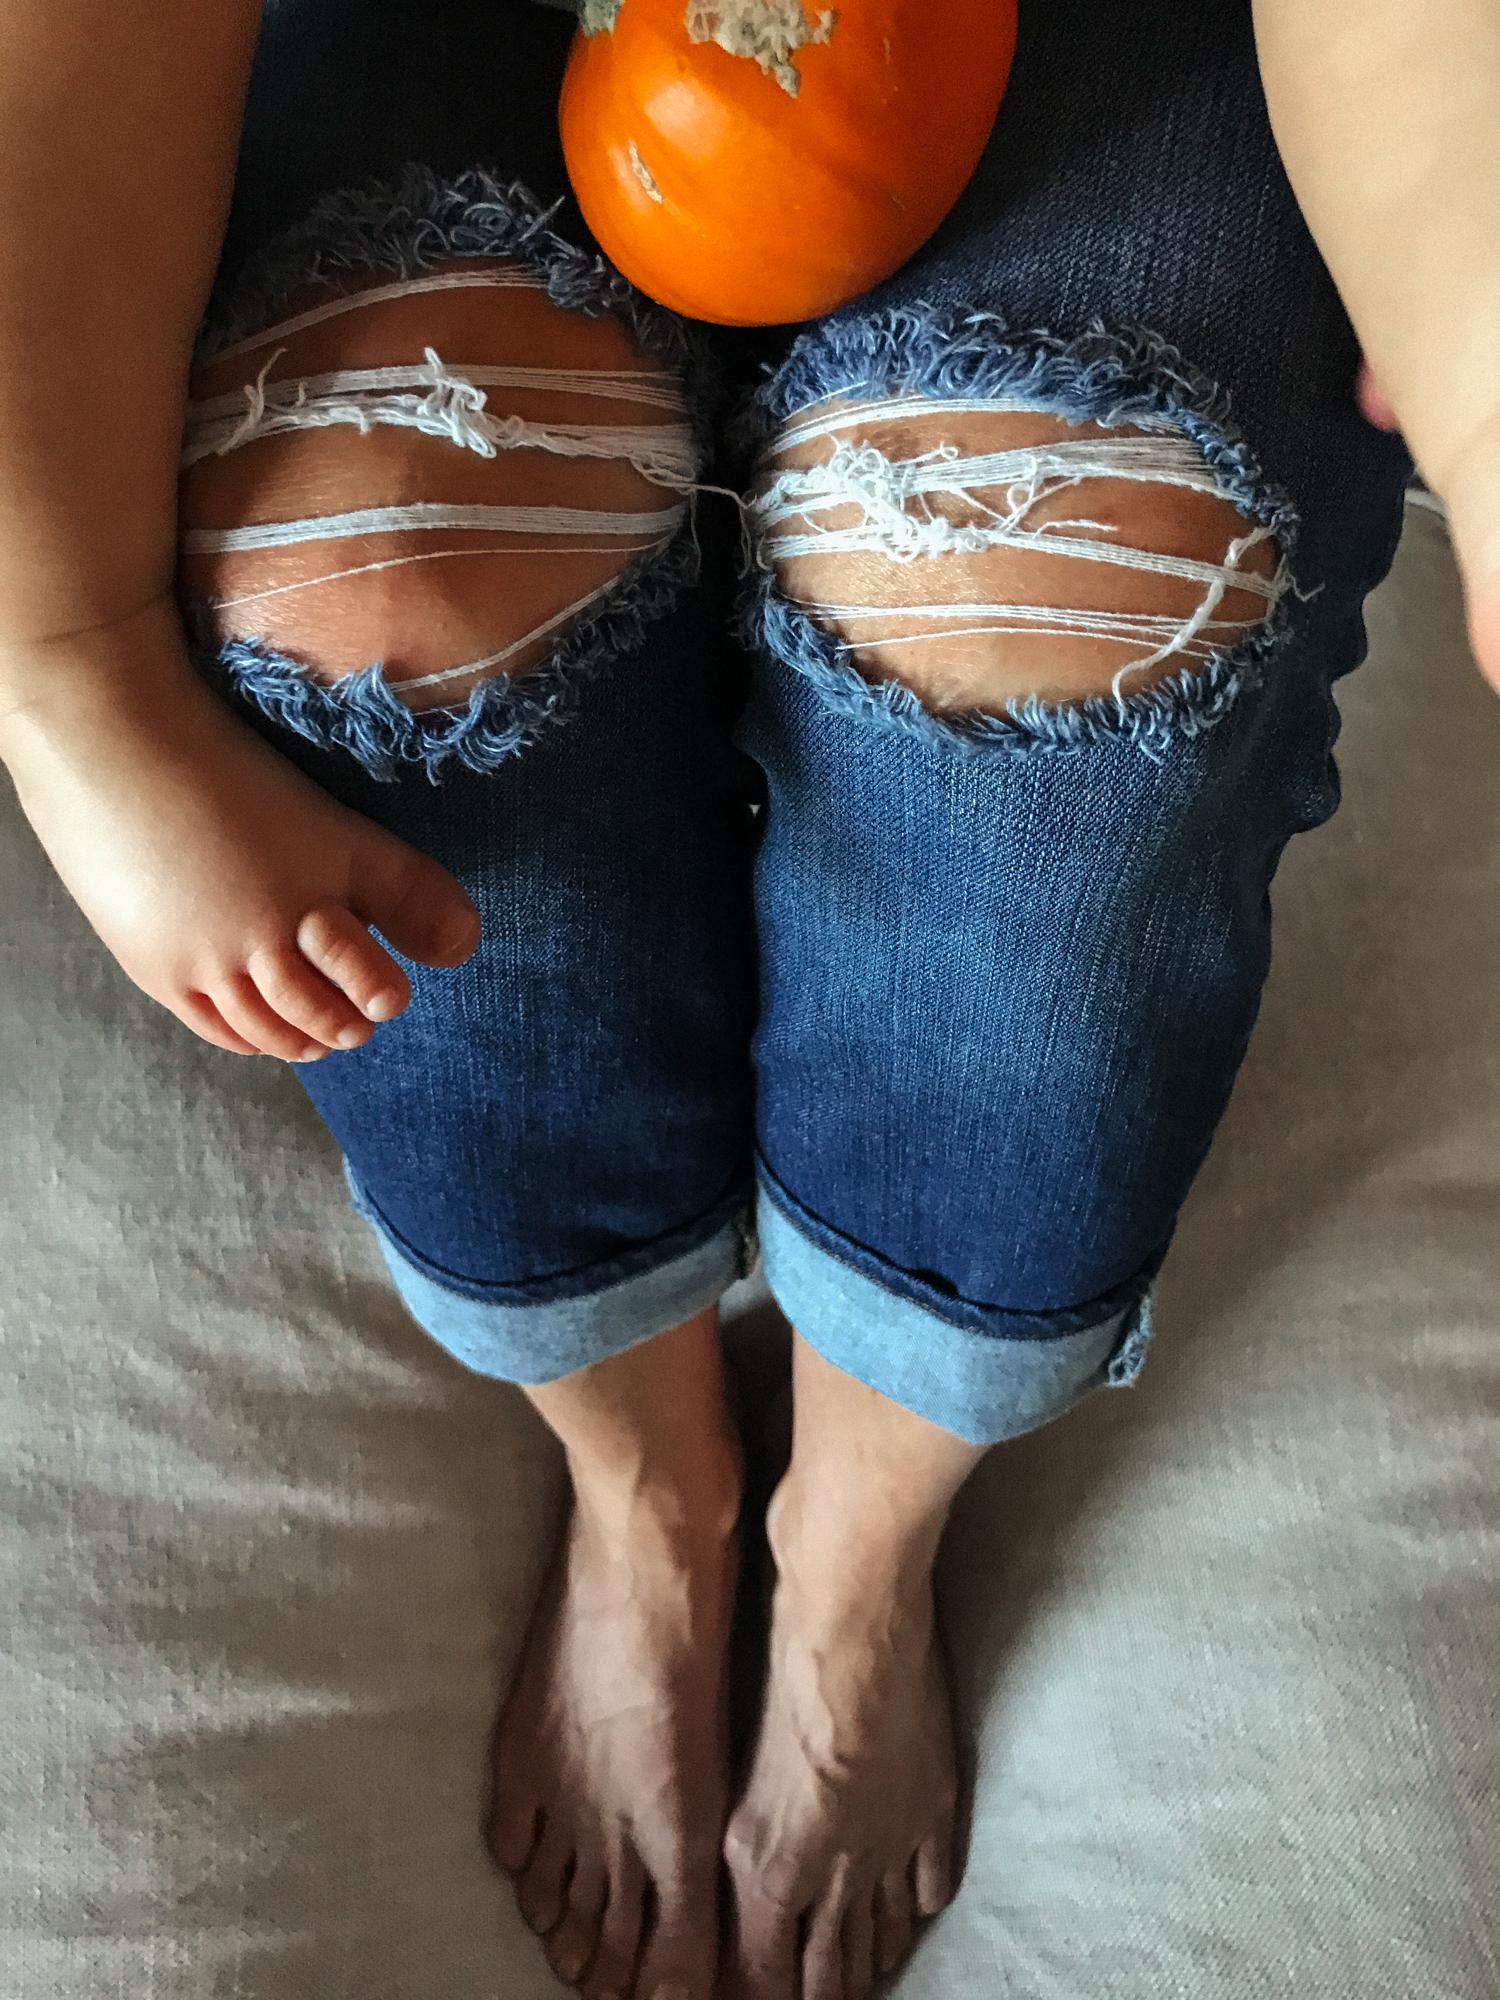 Baukjen nursing maternity mom style mom fashion mothercare family halloween festive cosy fun play time mommy blog